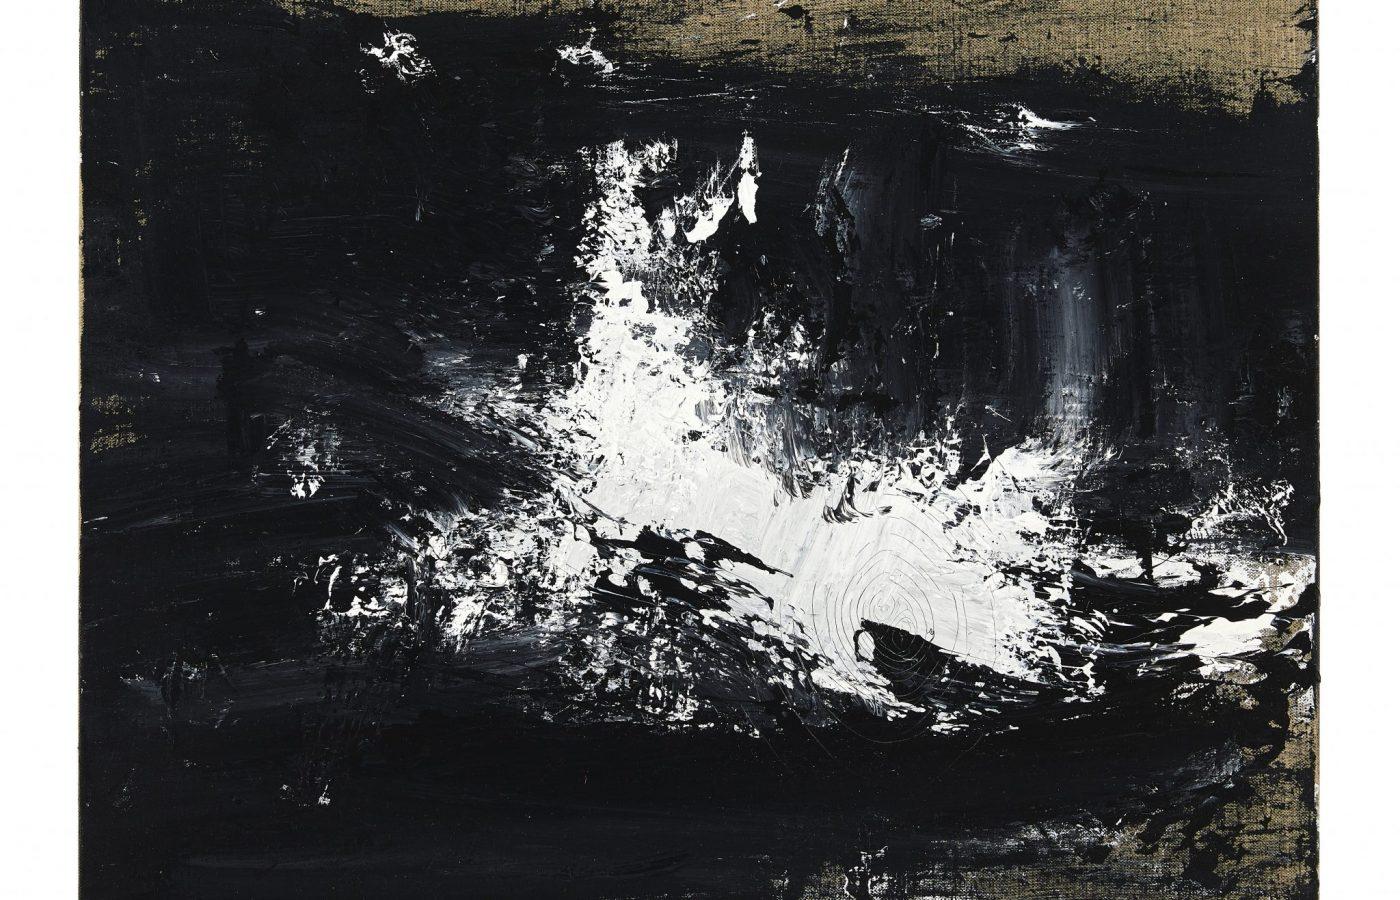 FXF18-52 John Virtue Untitled No 16 2016-17